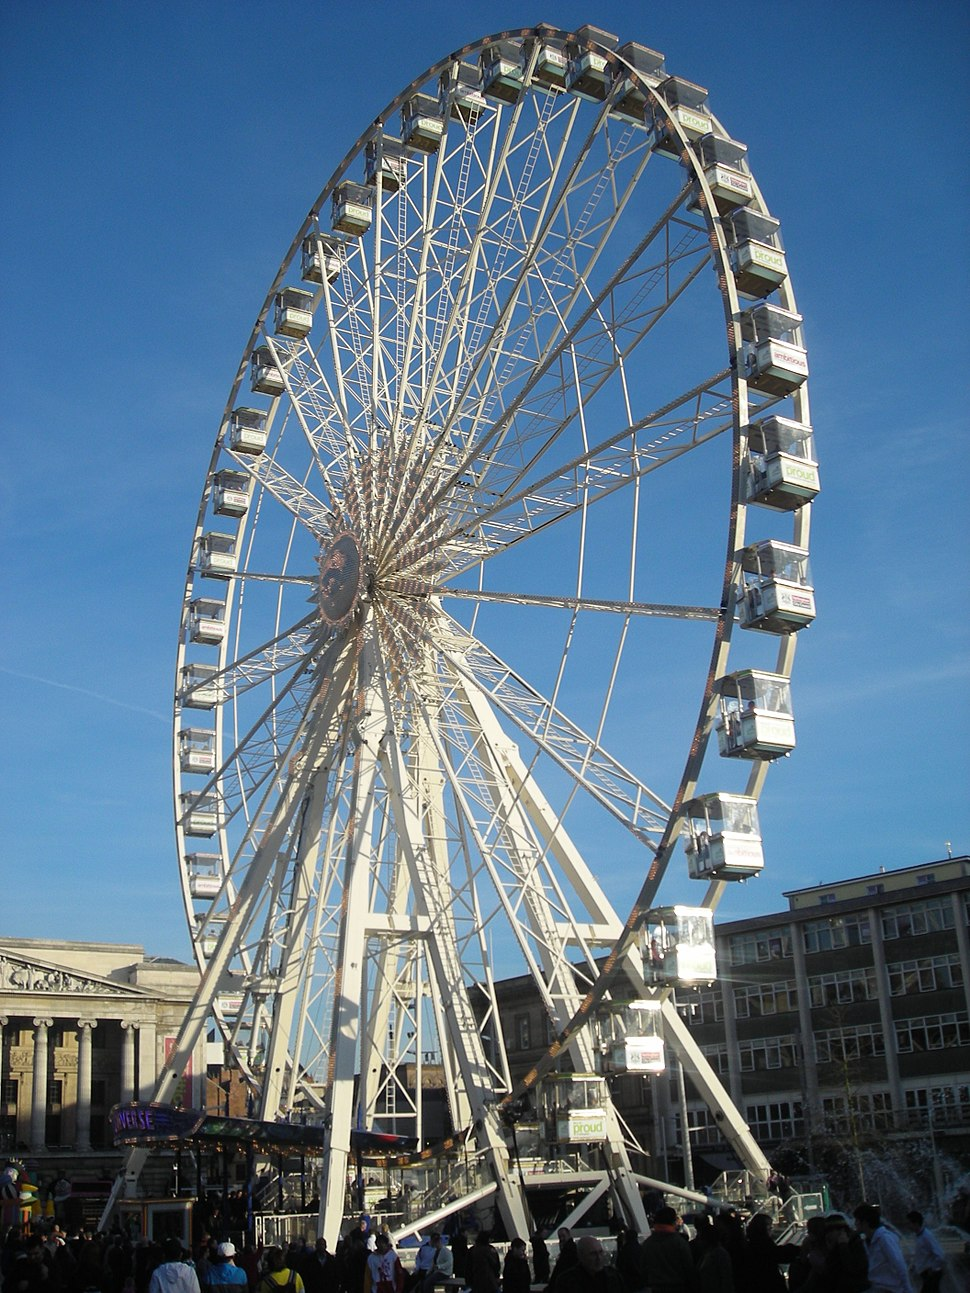 Nottingham Market Square Ferris Wheel